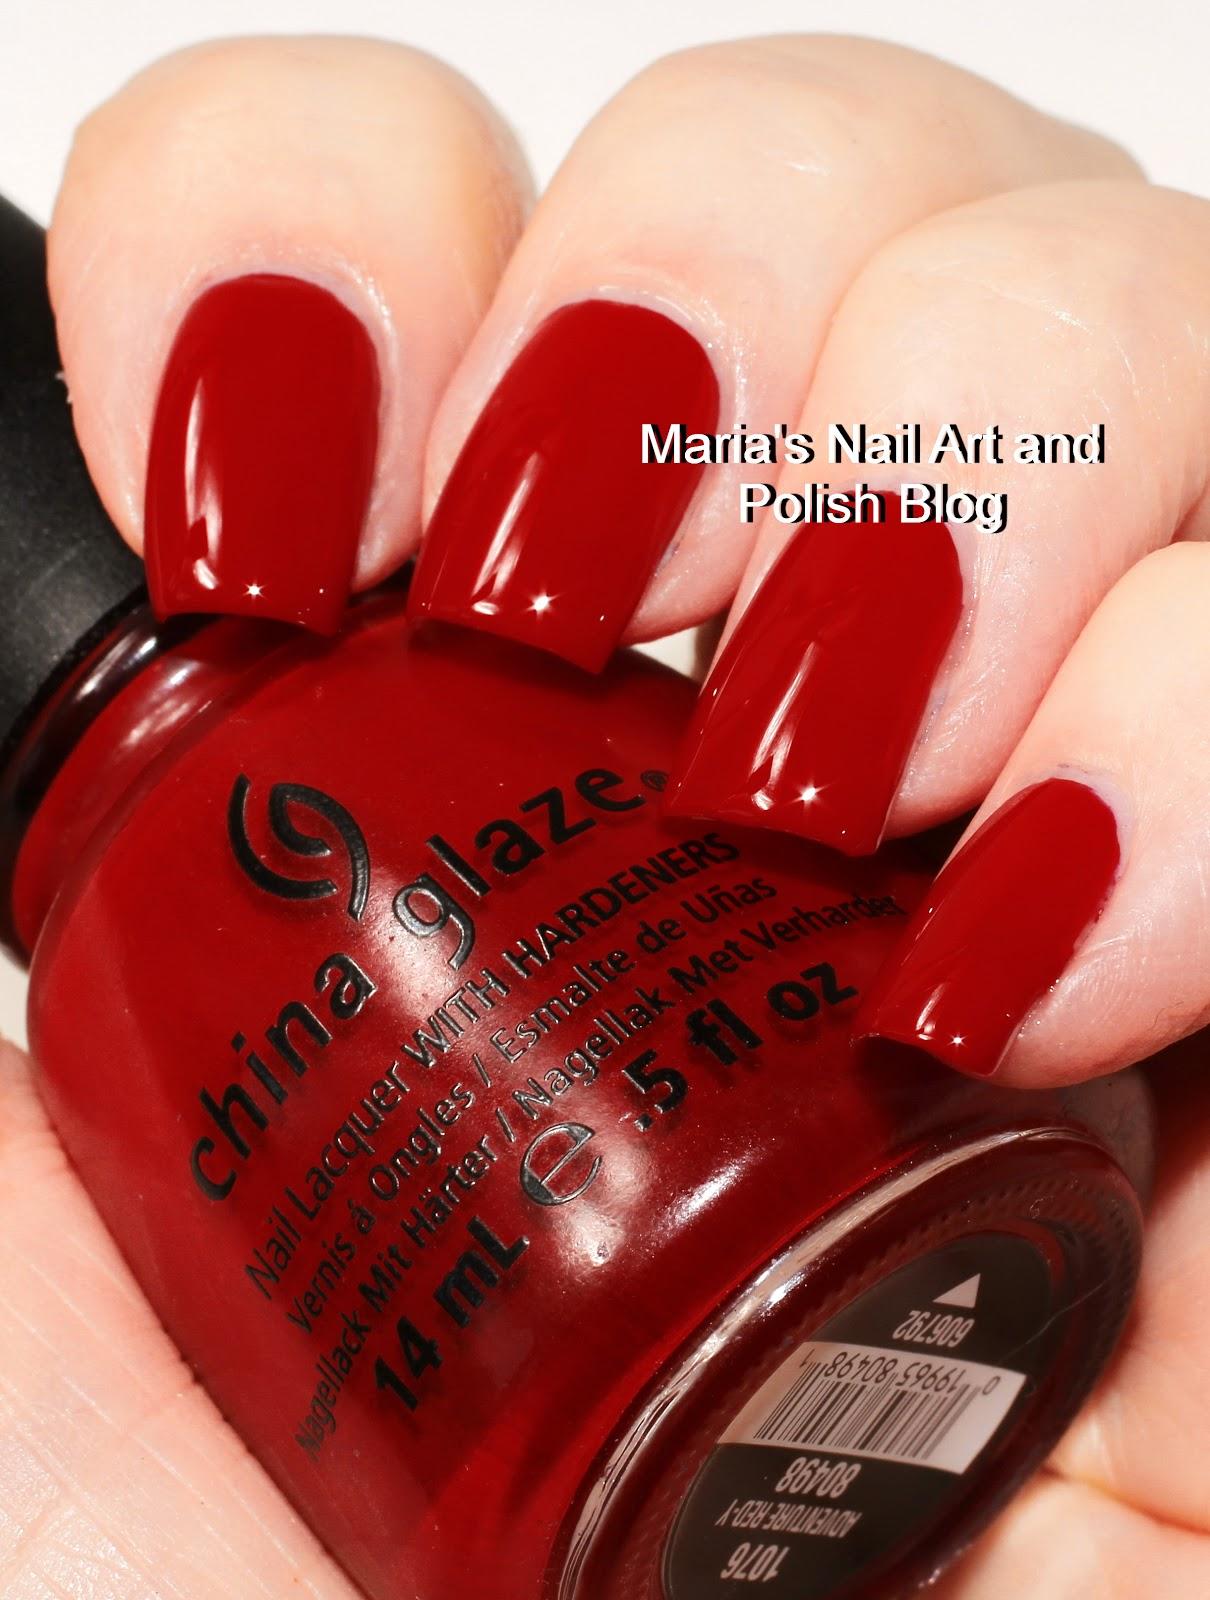 China Glaze Presenta Crakle Glaze: Marias Nail Art And Polish Blog: China Glaze Four Shades